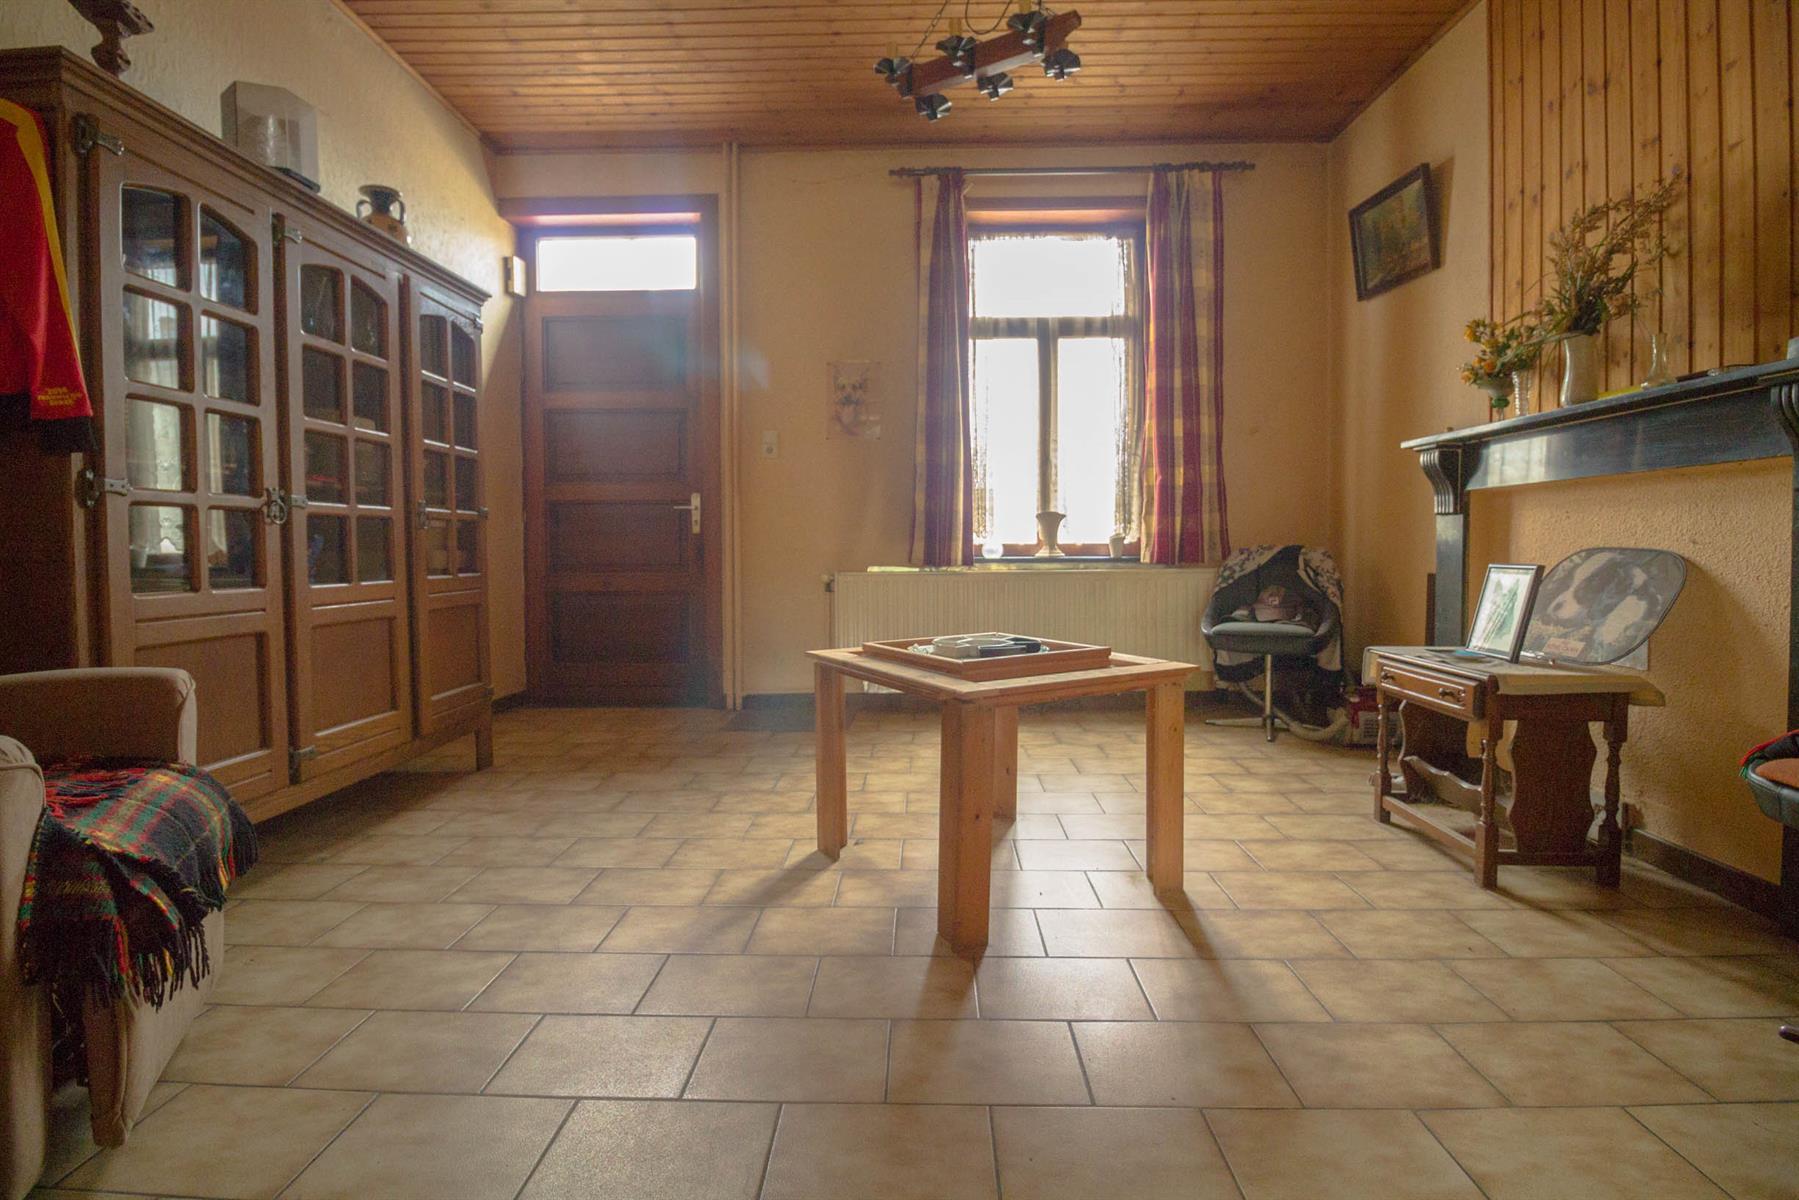 Maison - Lobbes - #4181112-1